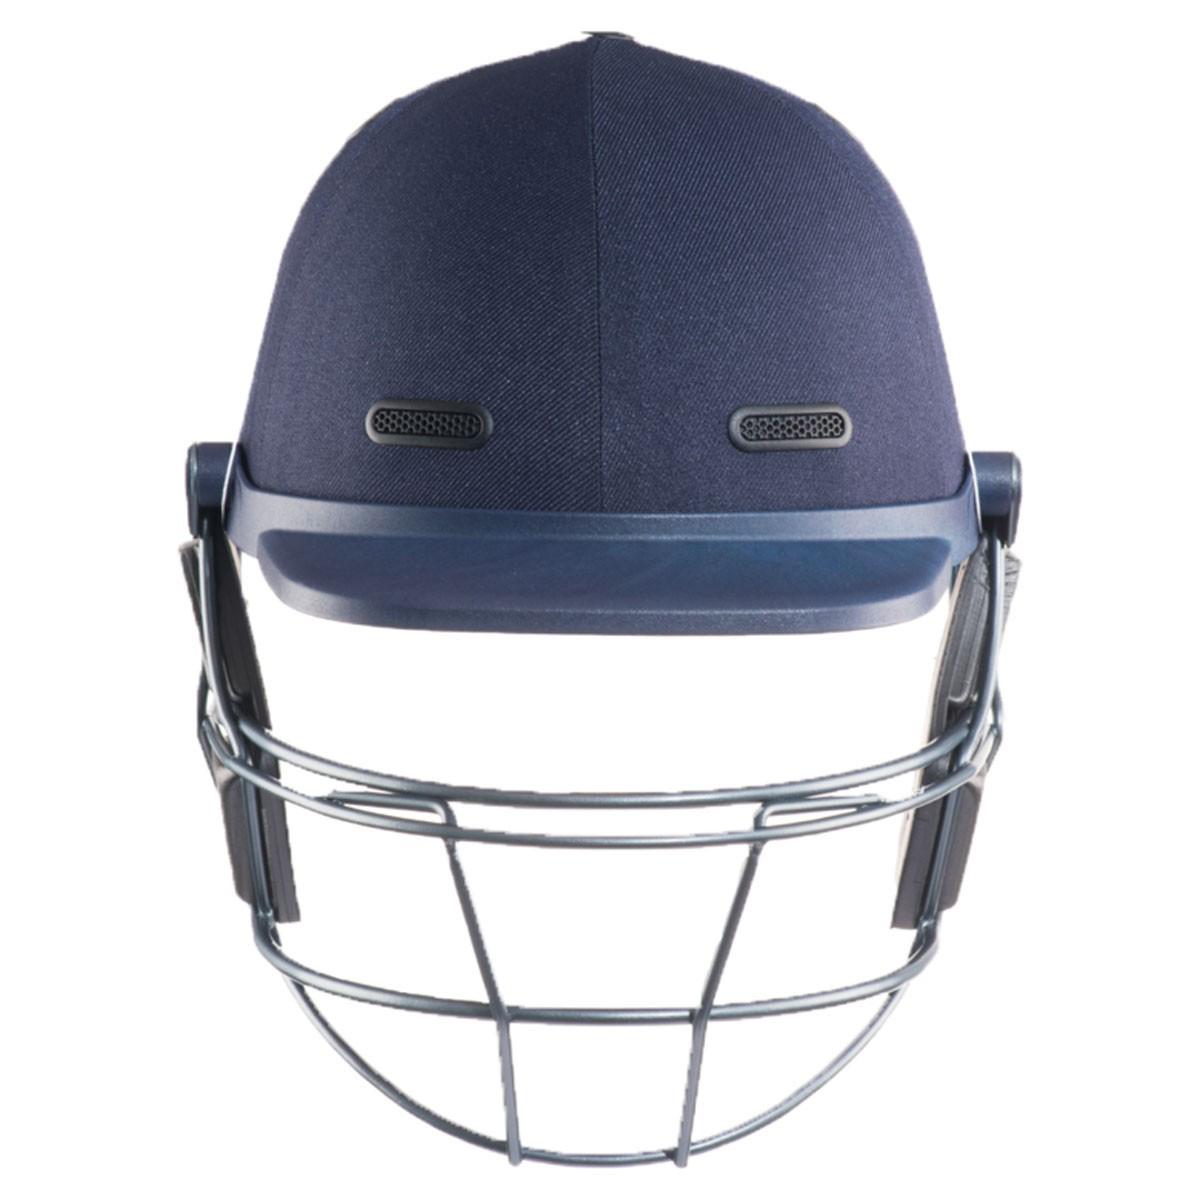 Masuri Vision Series Elite Steel Helmet Navy